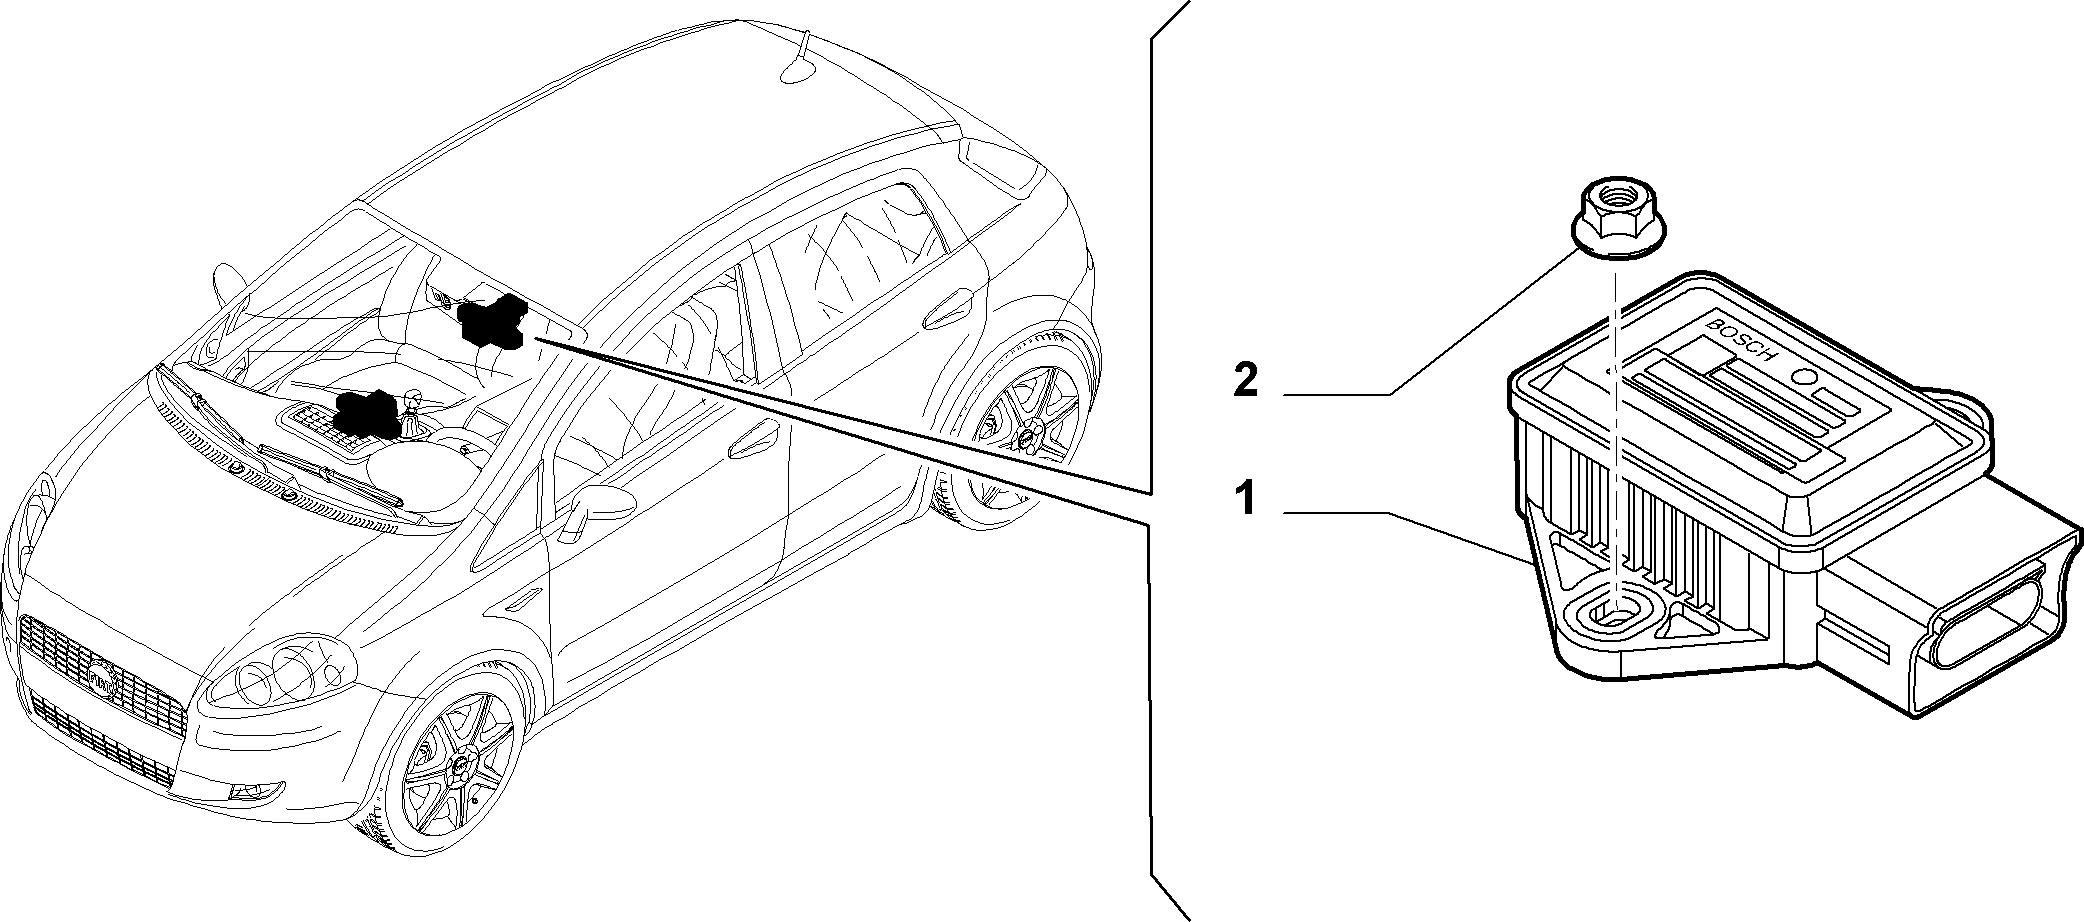 33102-080 ANTI-SKID SENSOR